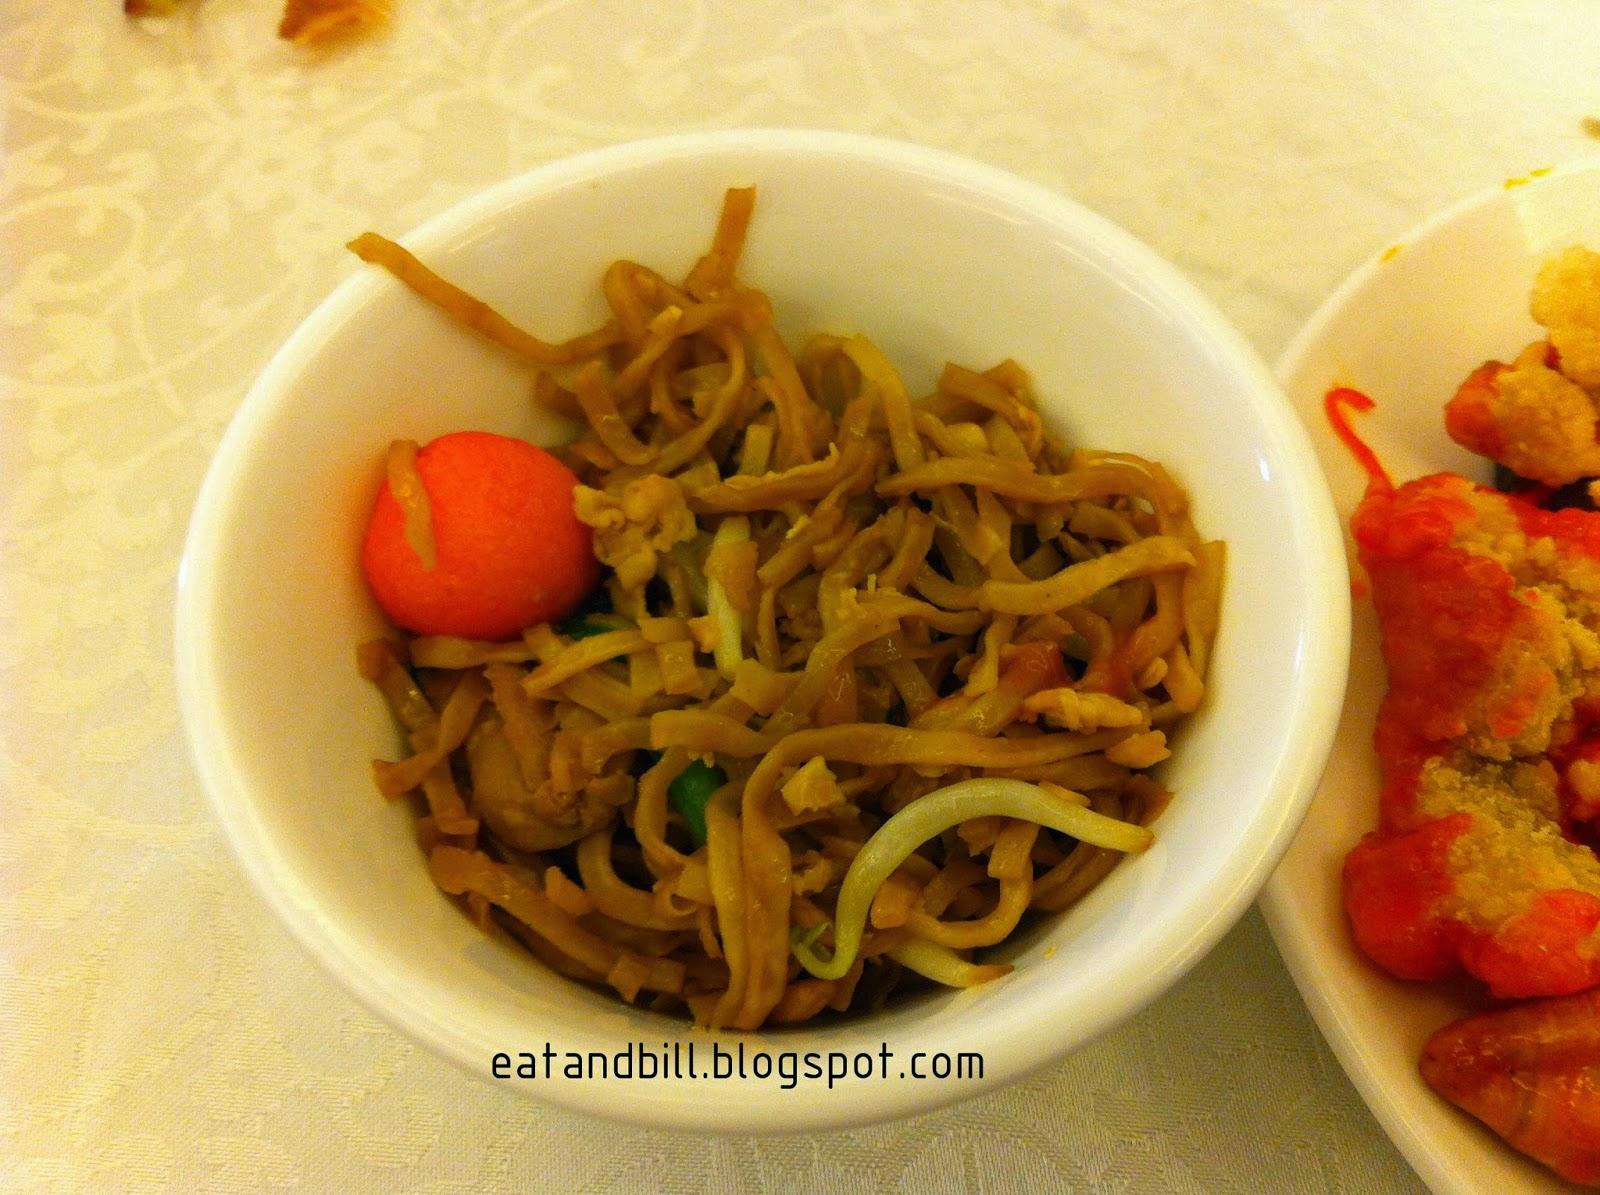 Eat And Bill April 2015 Indomie Salted Egg Goreng Telur Asin Udang Telor Fried Prawn With Sauce Mie Ulang Tahun